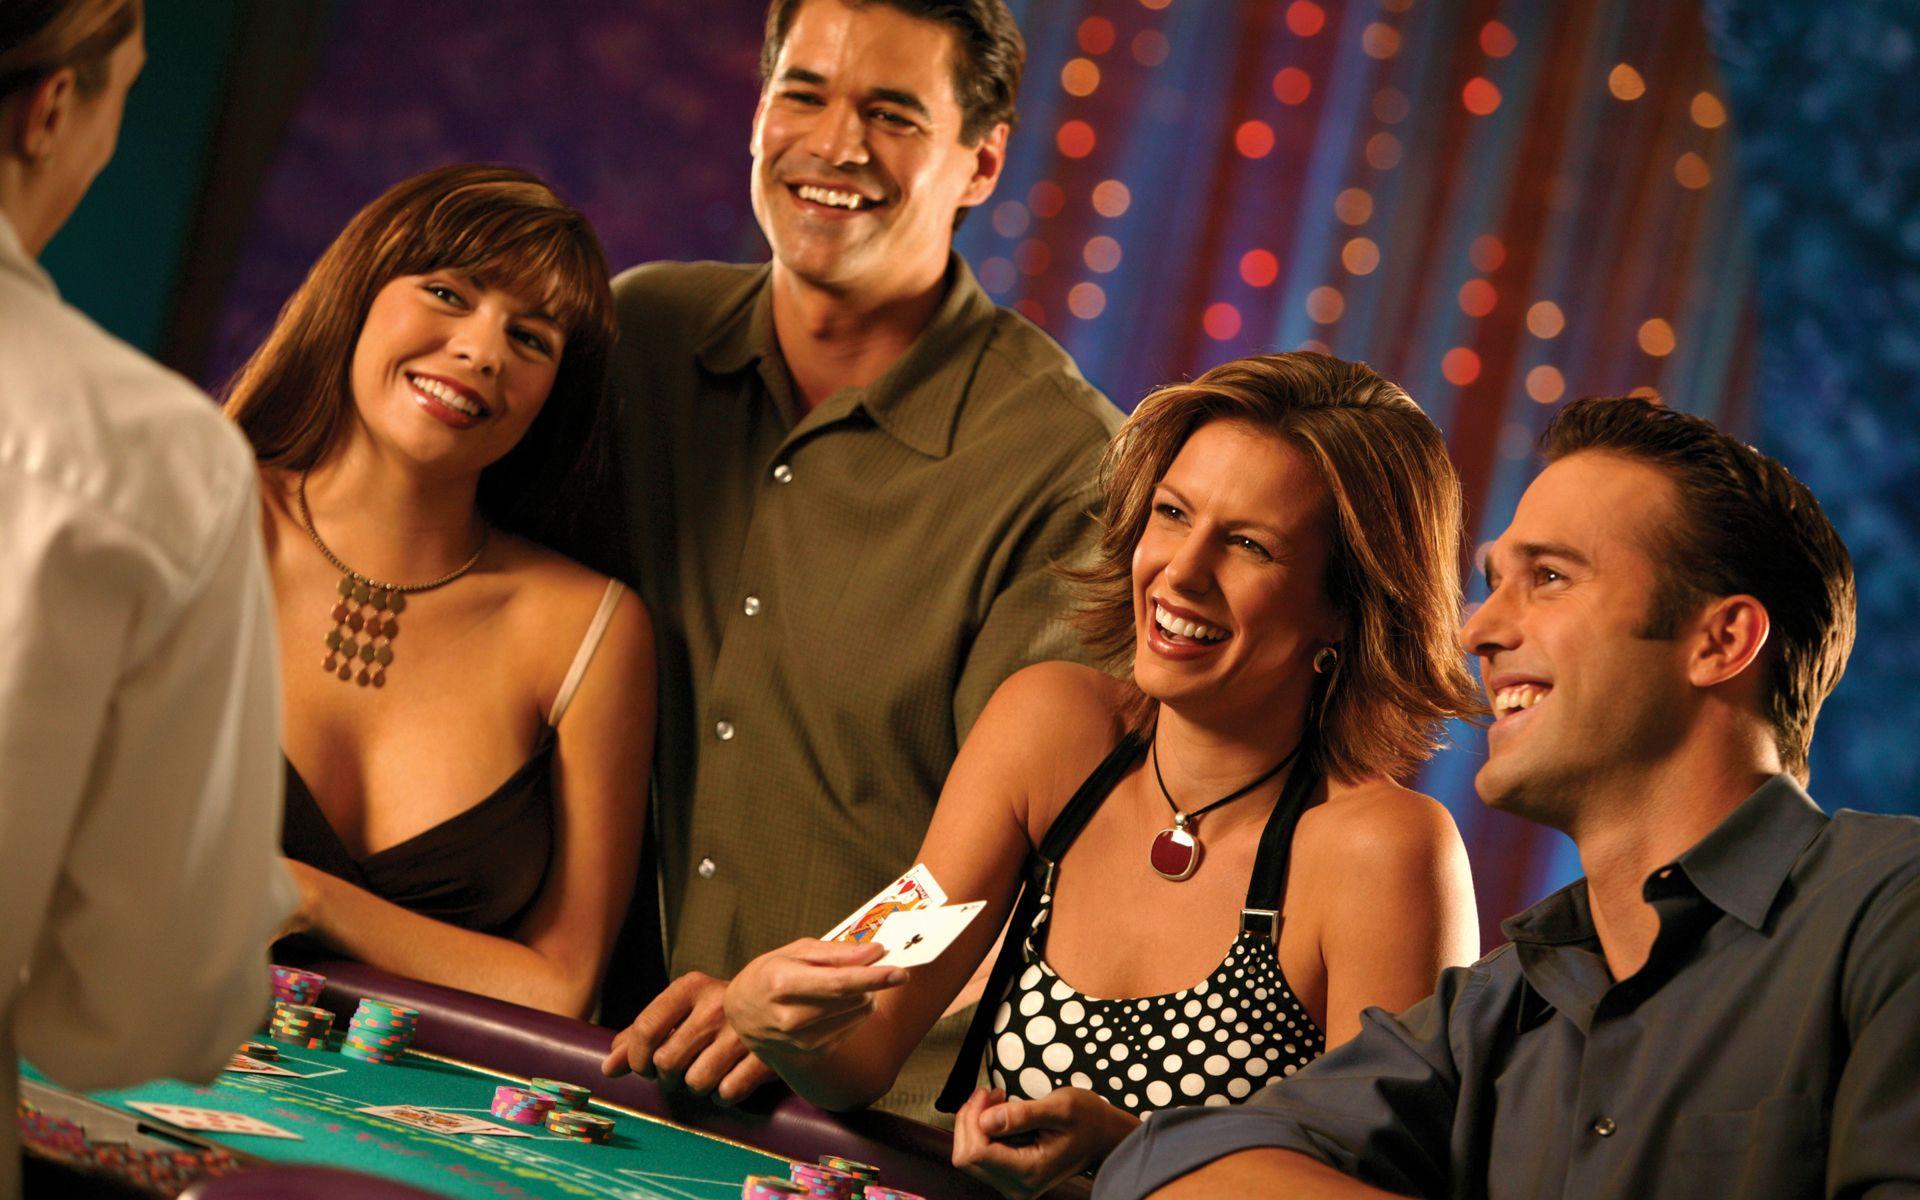 Blackjack, le jeu qui rapporte